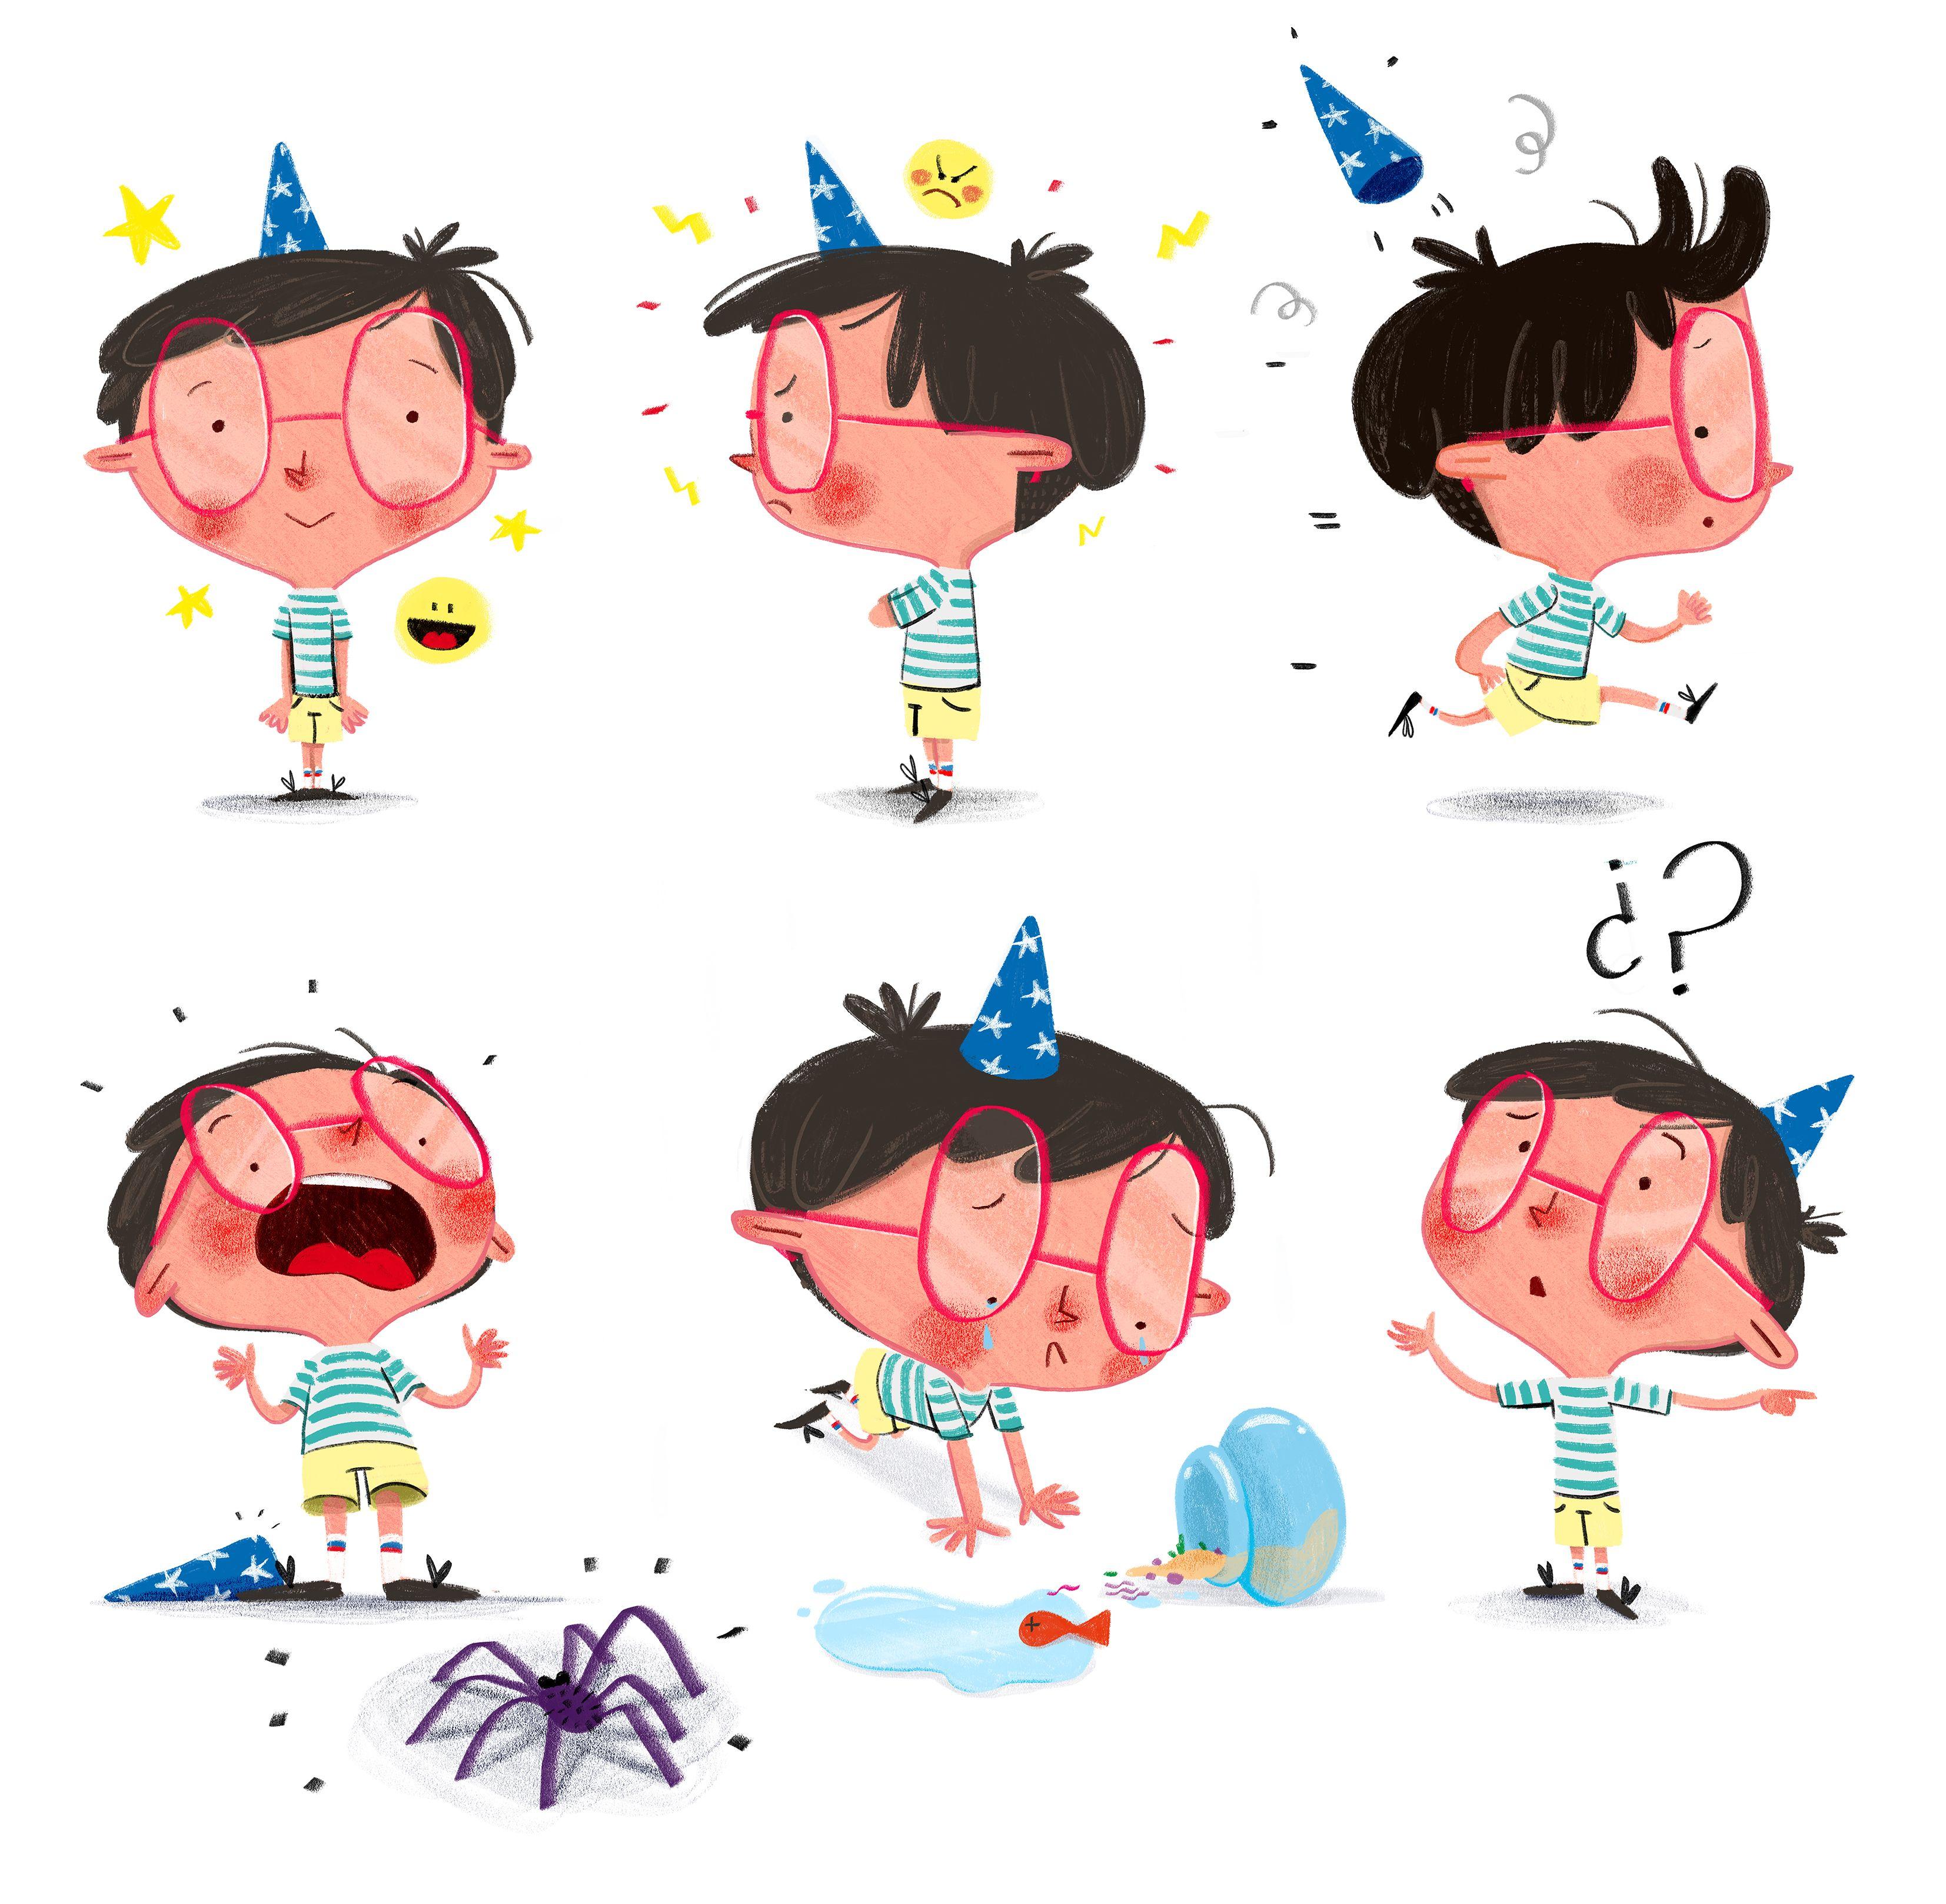 Https Www Instagram Com P Bie Vp5auxo Taken By Alicia Mas Illustration Illust Children S Book Characters Illustration Art Kids Children S Book Illustration